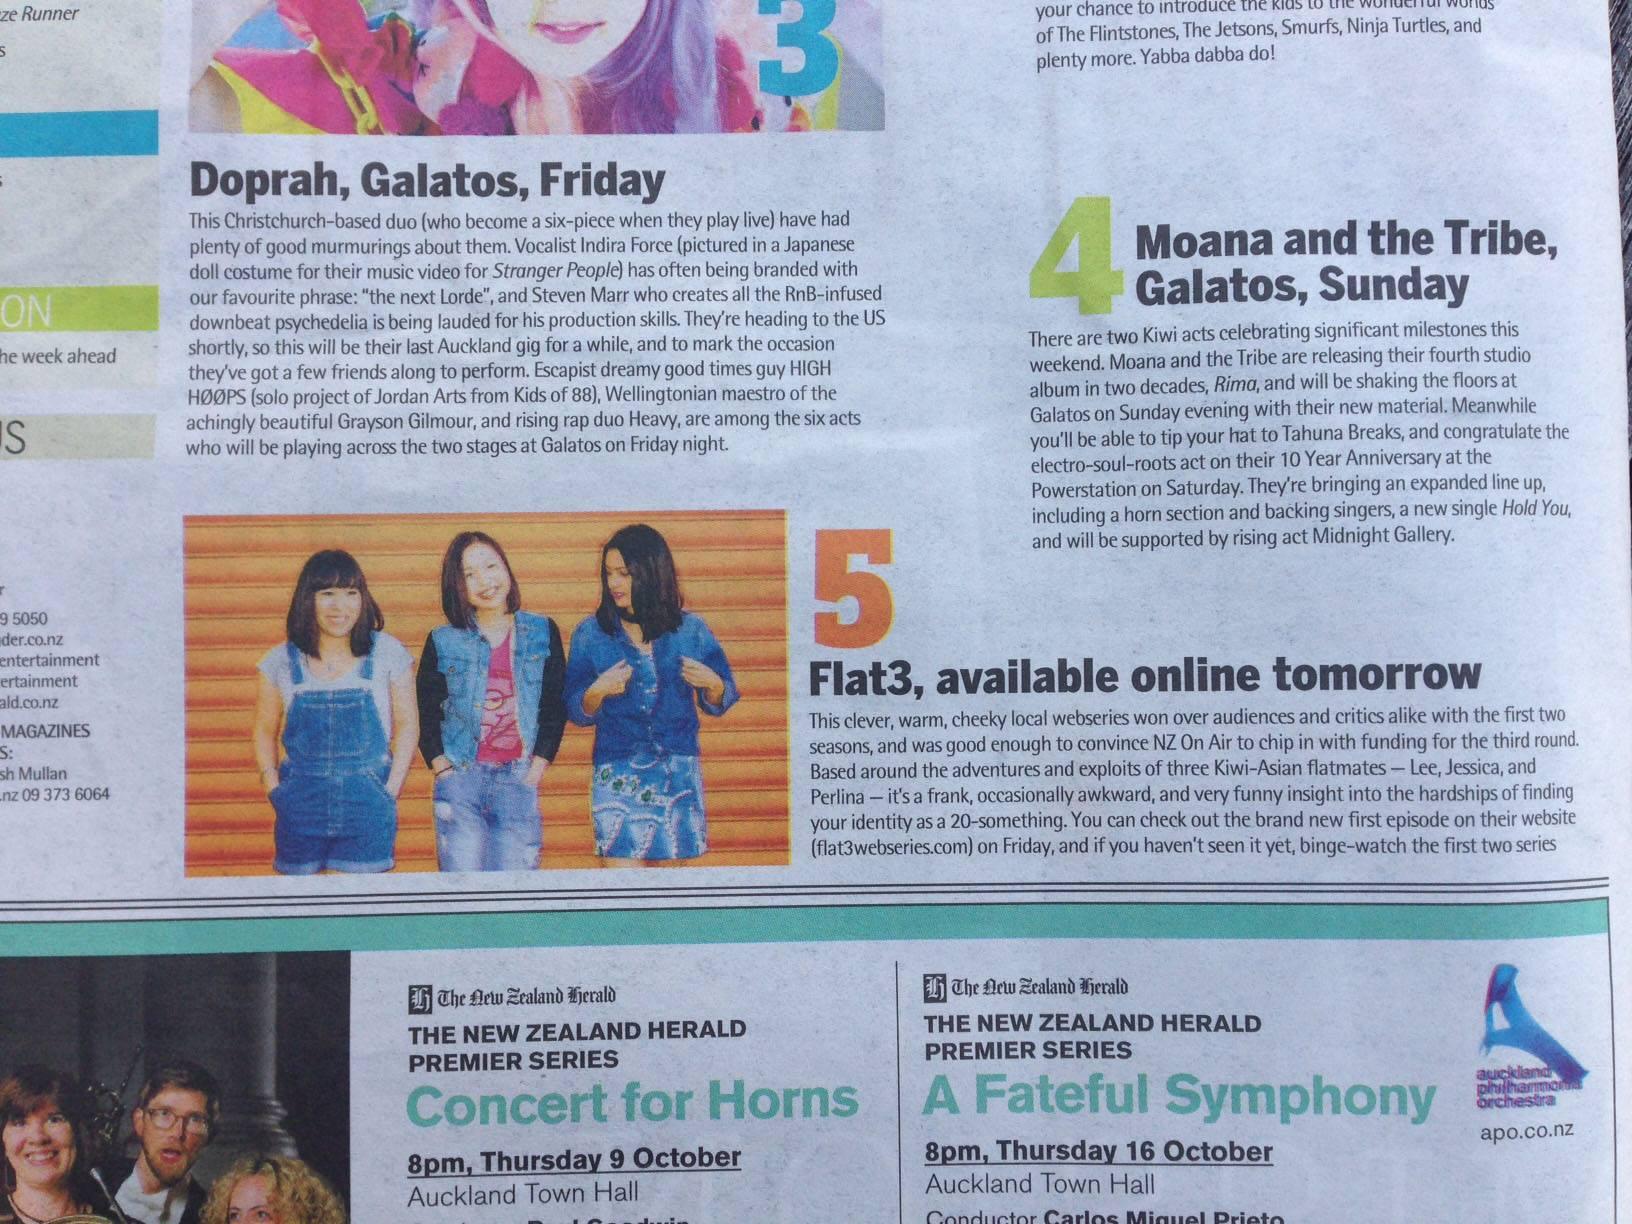 Timeout NZ Herald, 2014